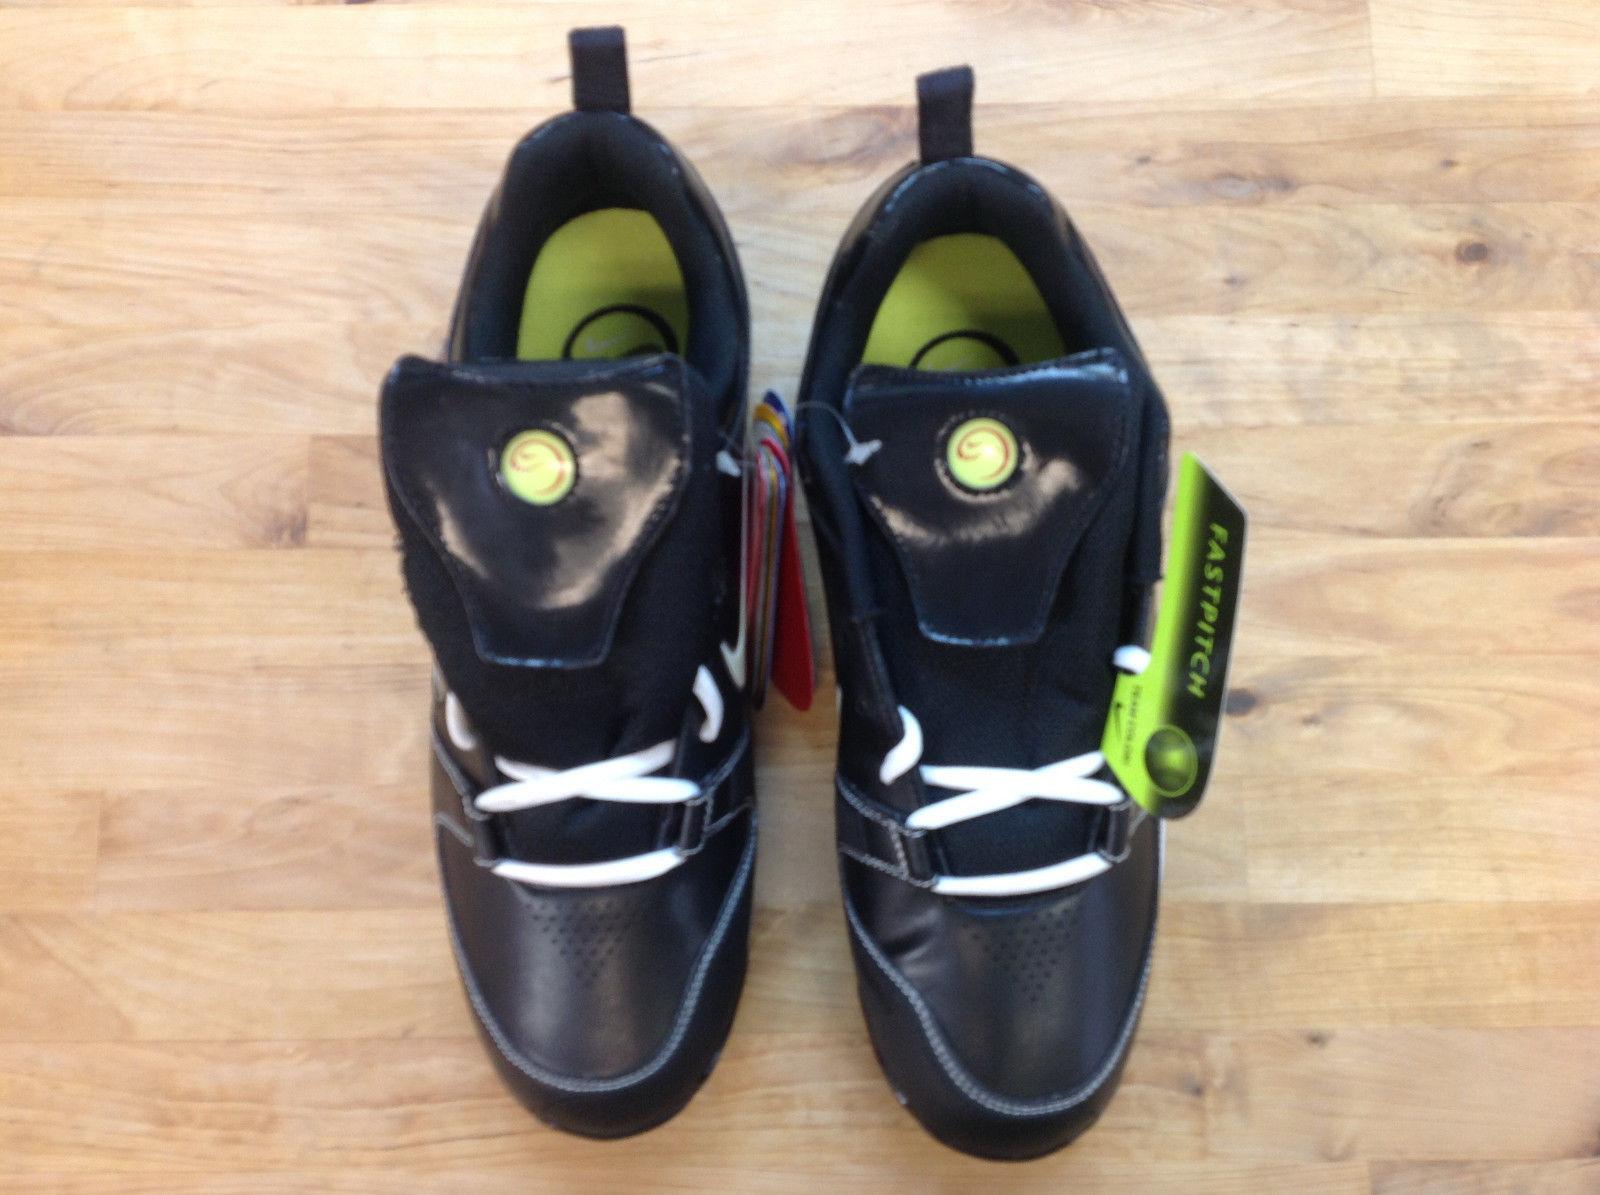 WMNS Nike Air Unify Pro, Black/White/Green, Size 11